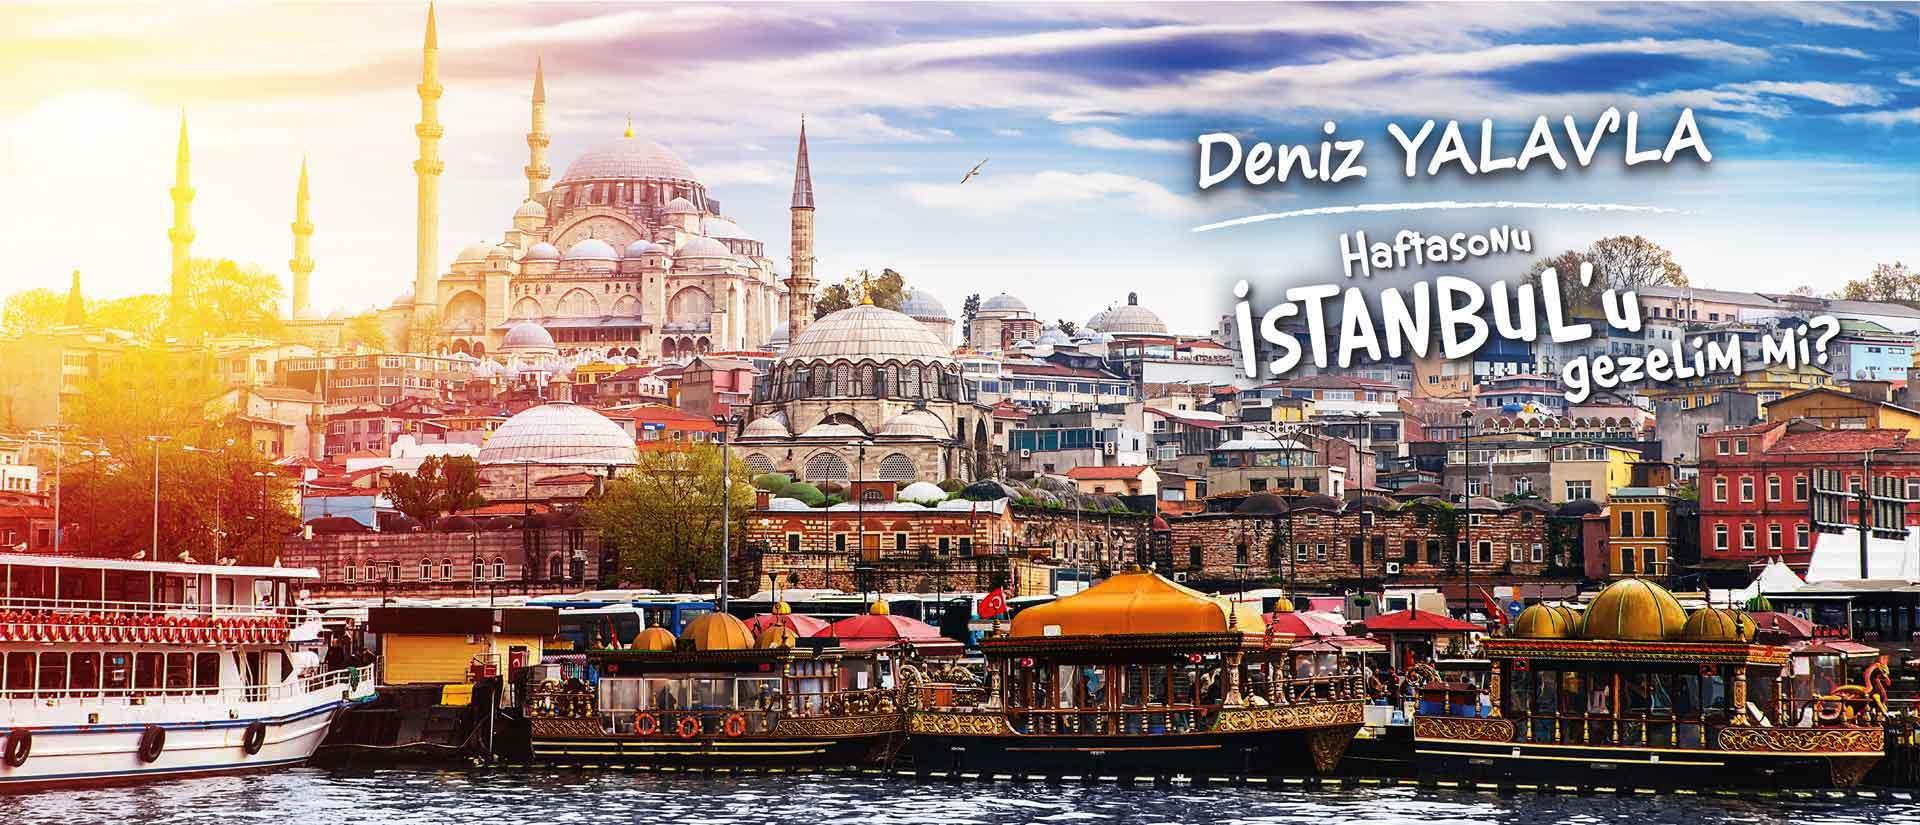 Peninsula_istanbul_gezileri